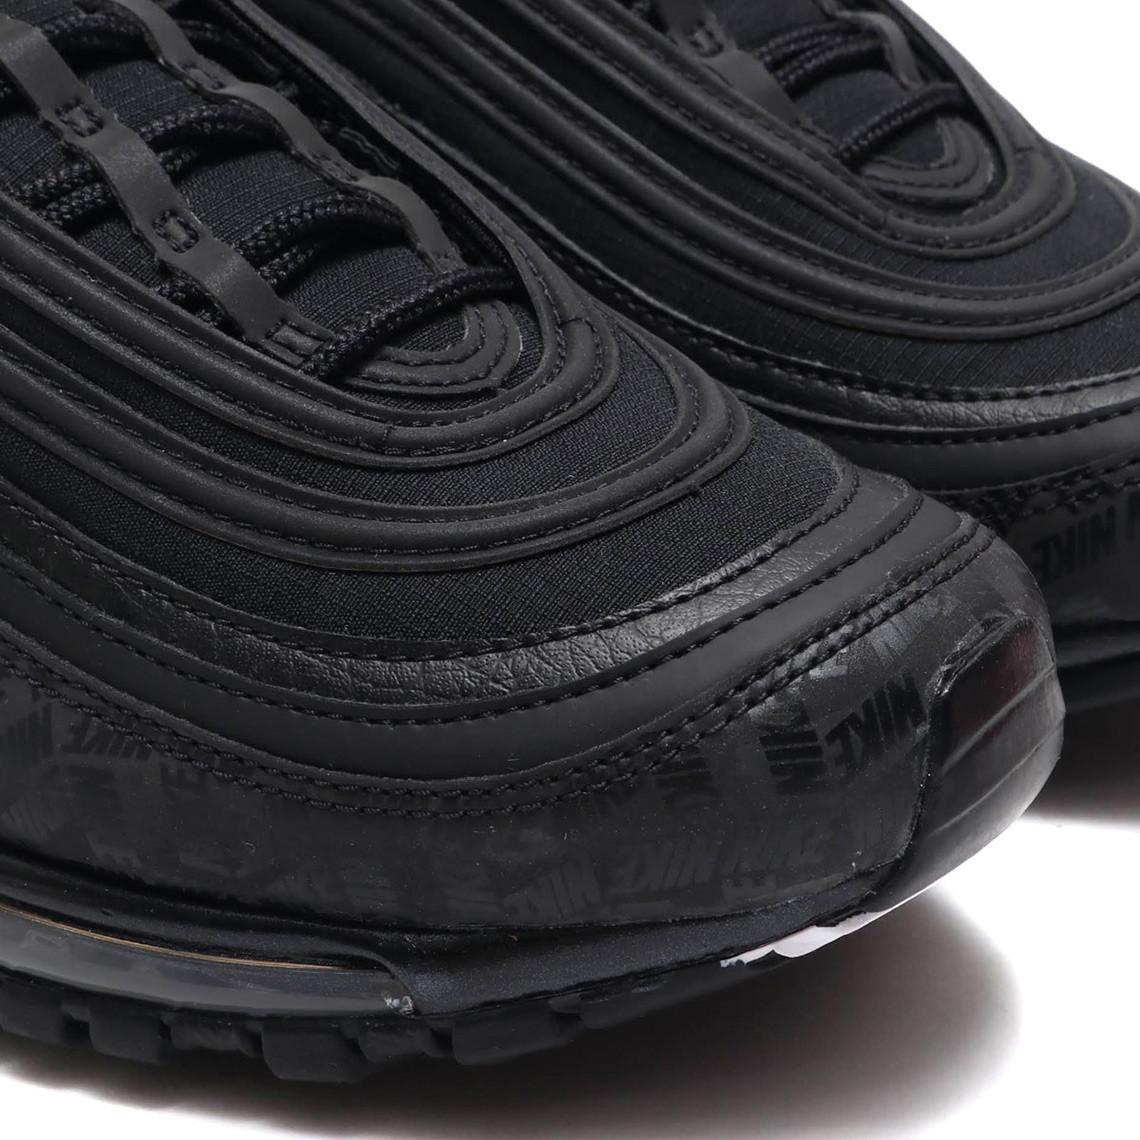 Nike Air Max 97 Off Noir Total Orange BQ6524 001 Release